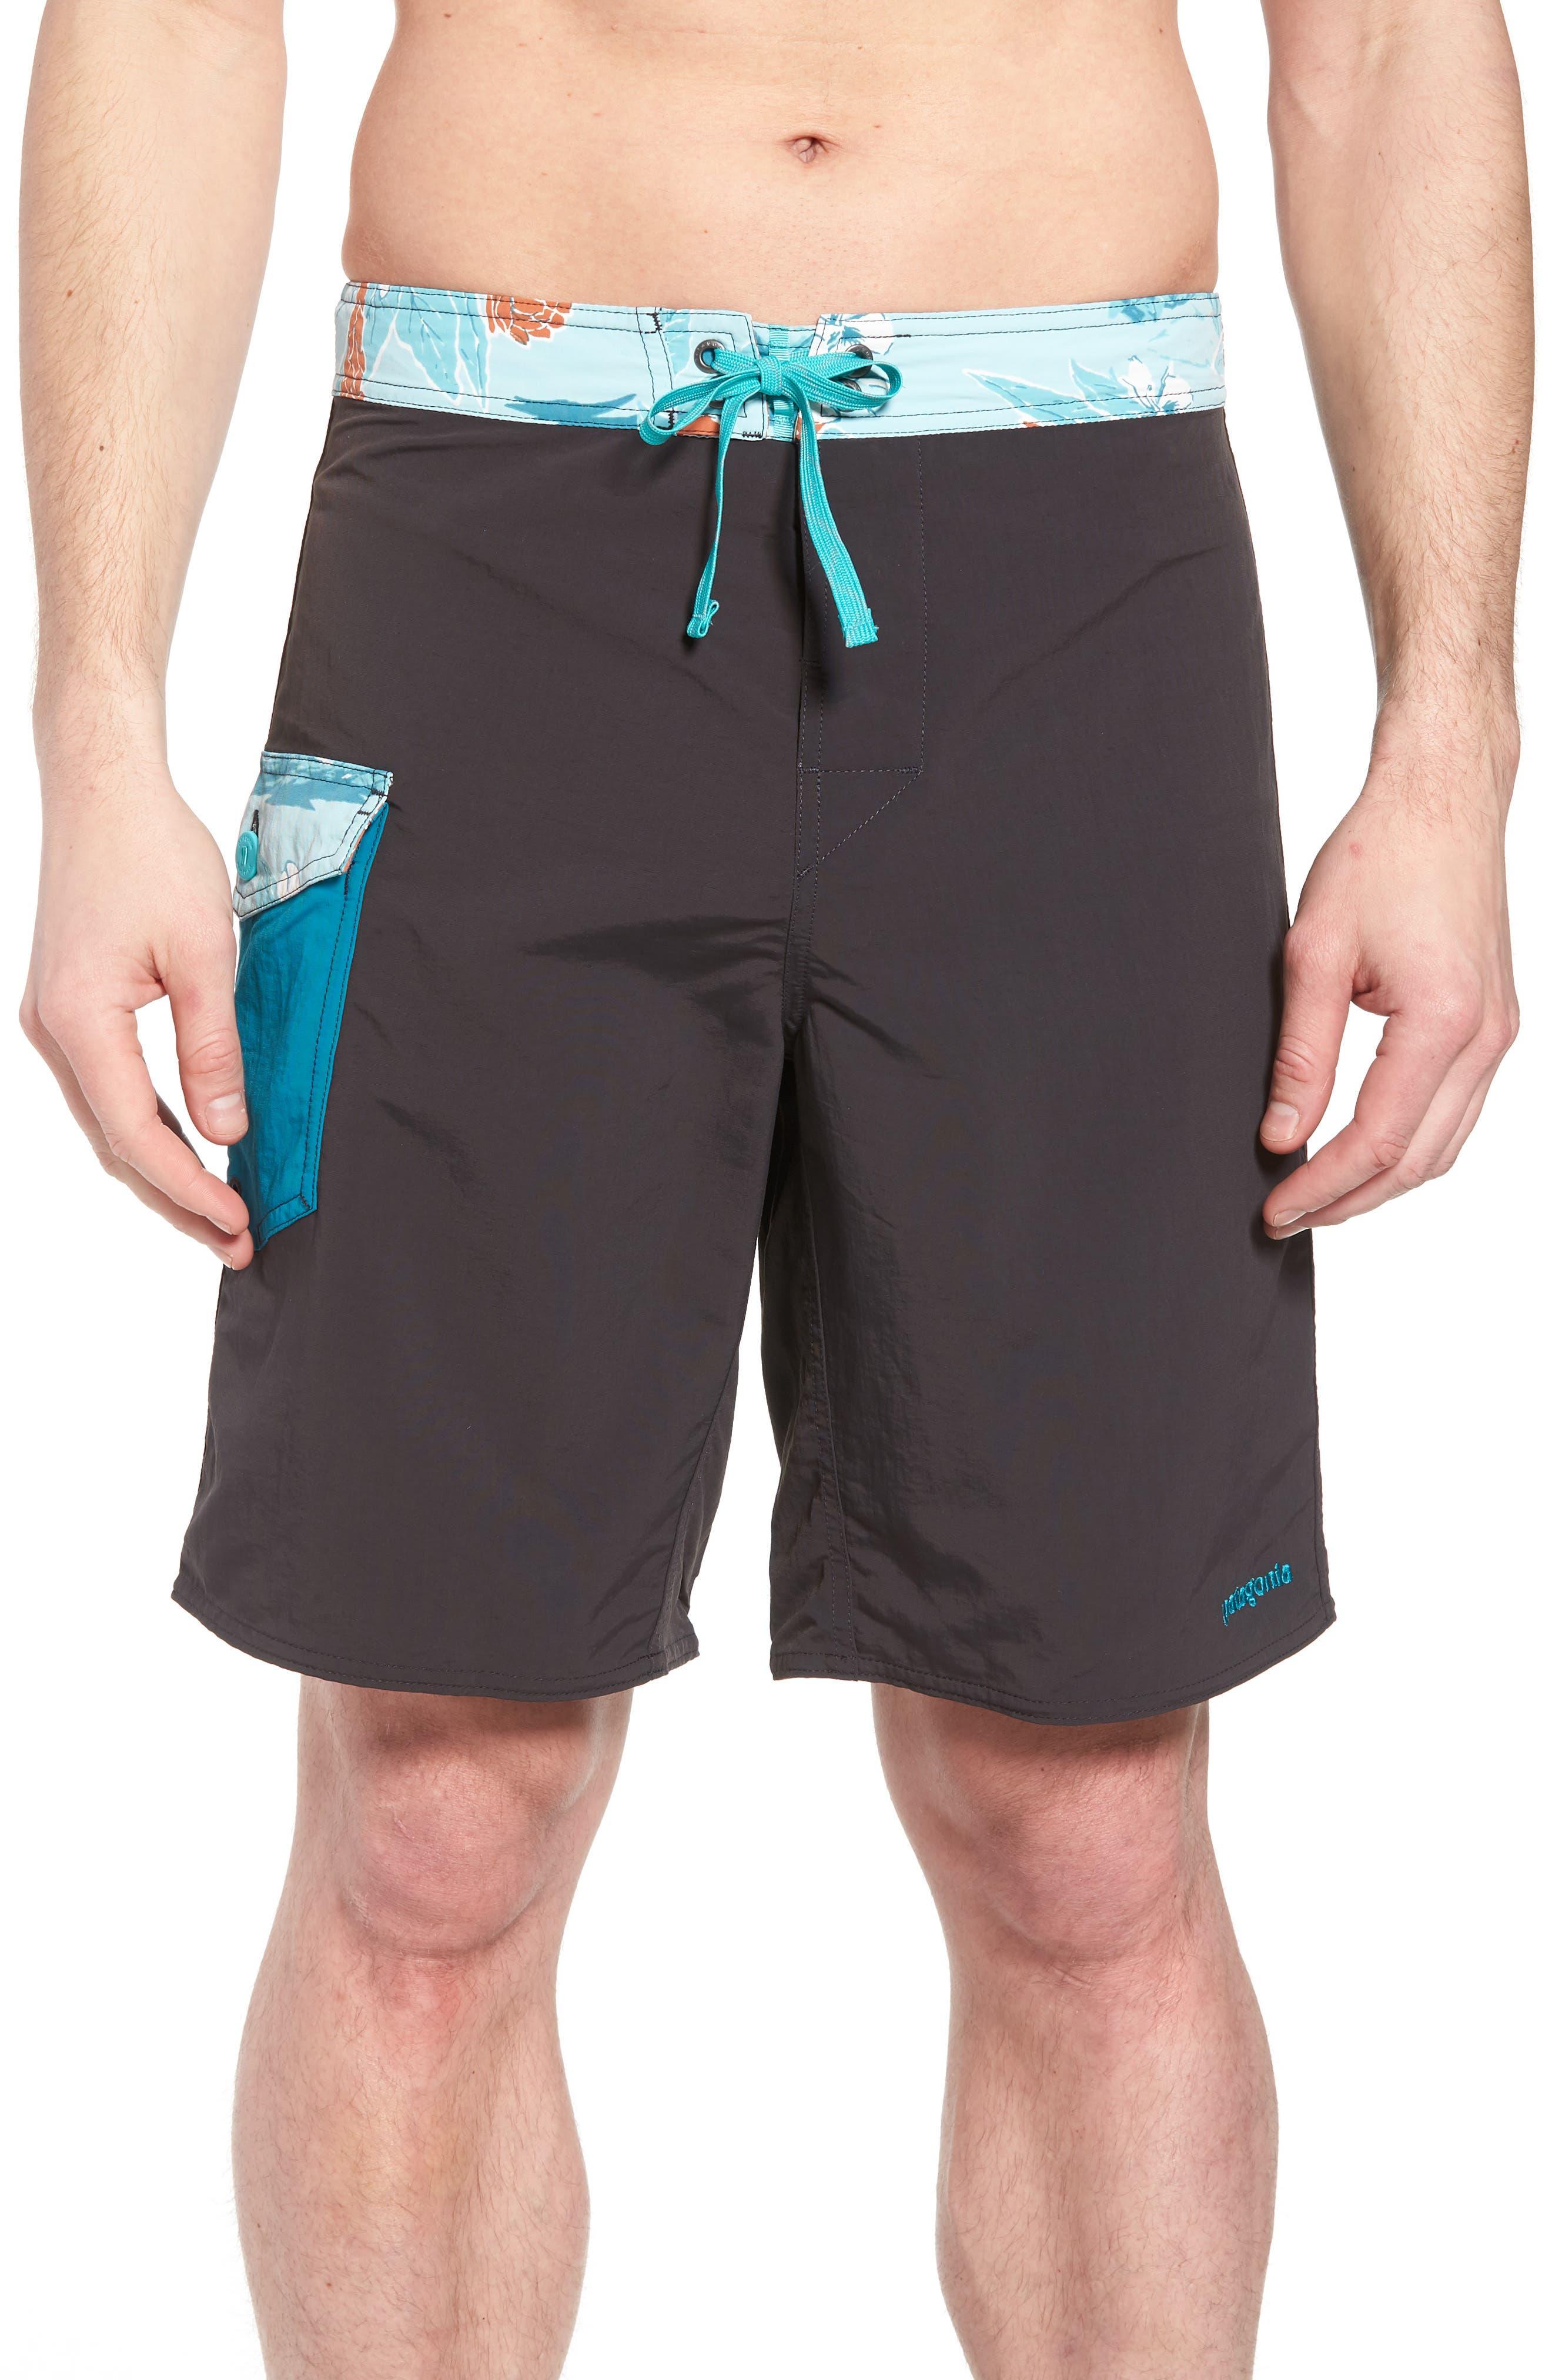 Wavefarer Board Shorts,                             Main thumbnail 1, color,                             001